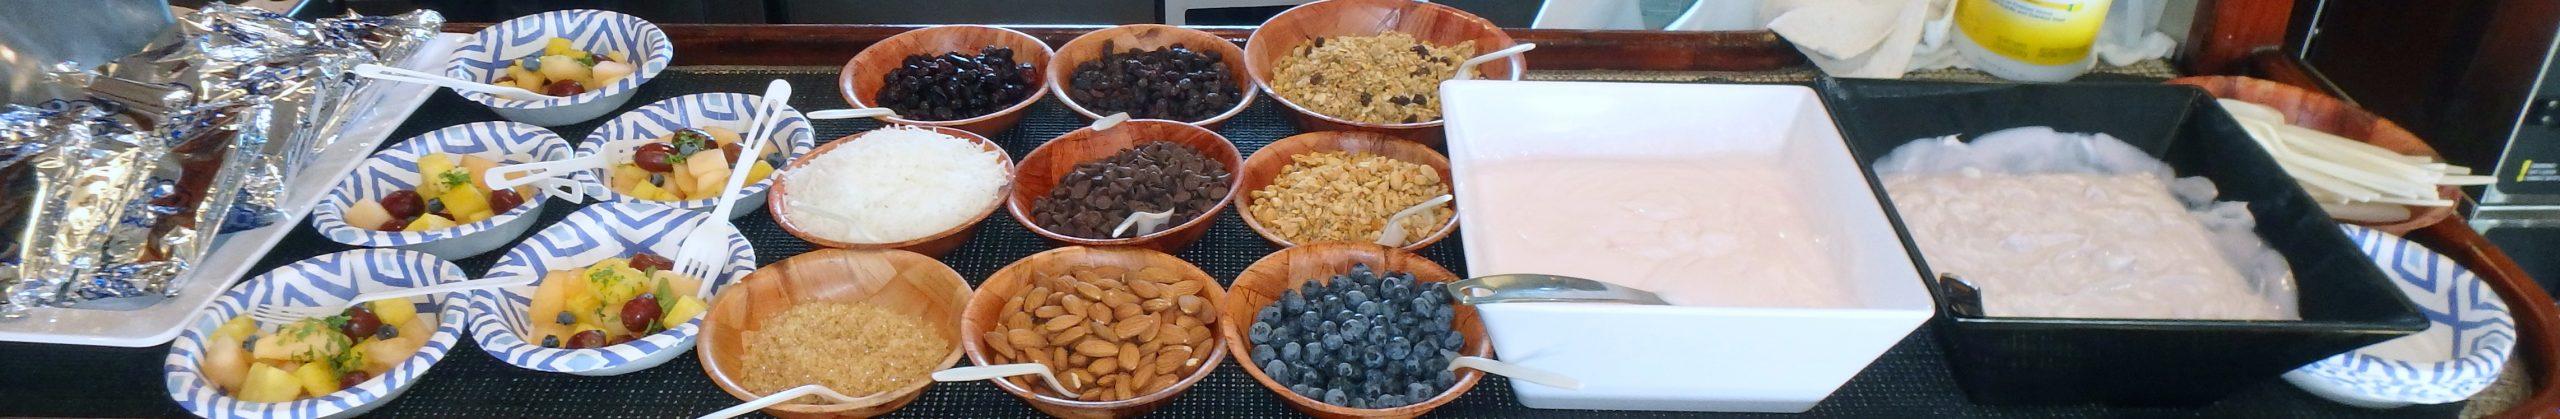 Organic Breakfast Bar